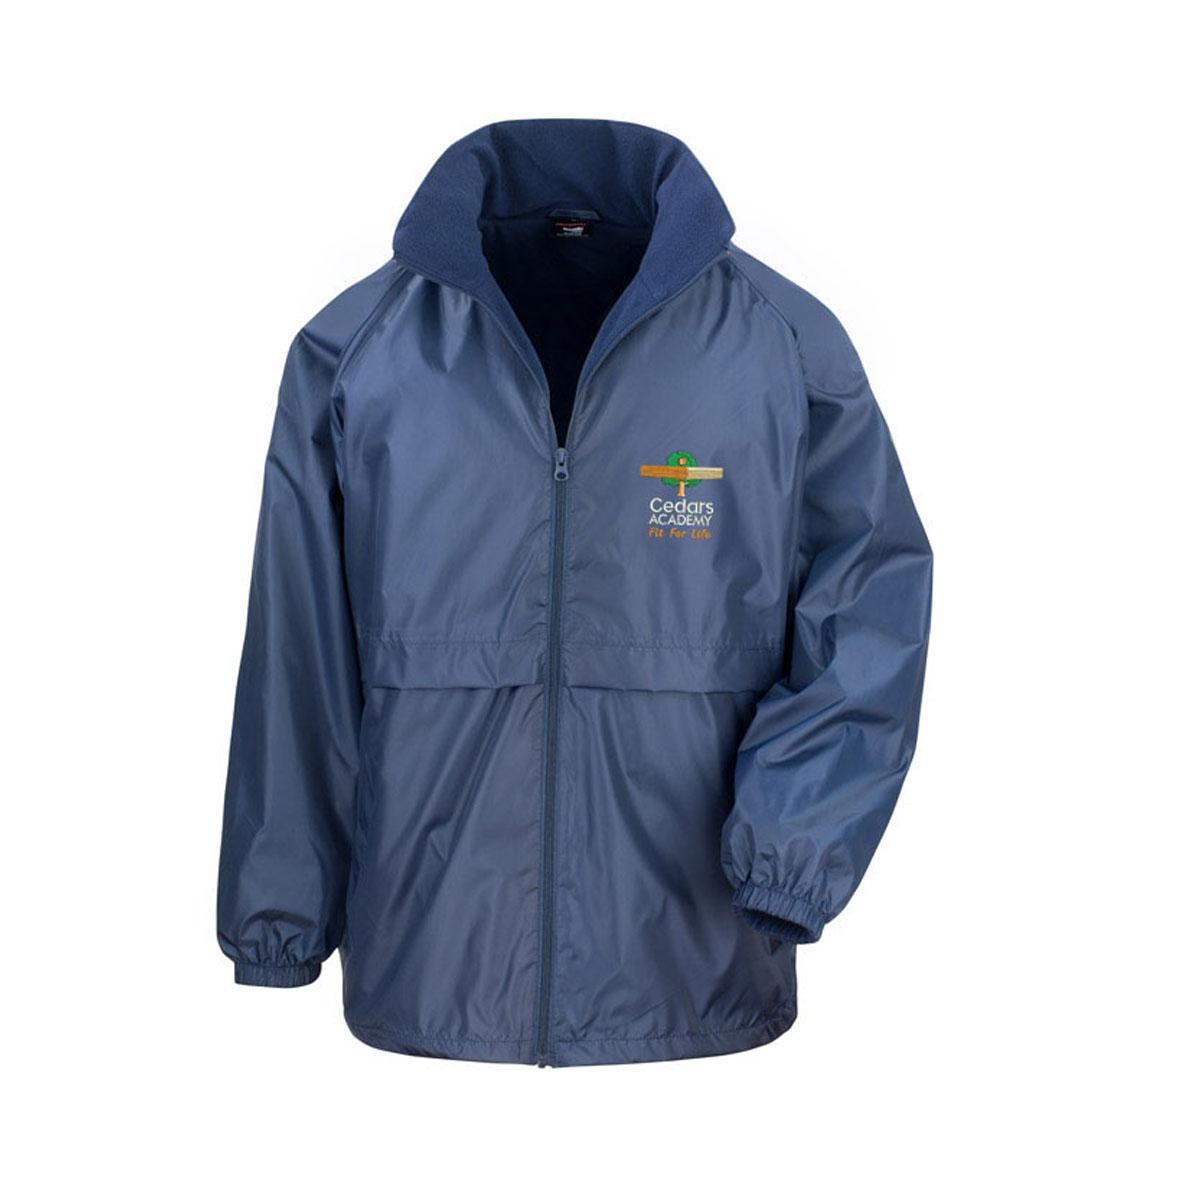 Cedars Lightweight Jacket